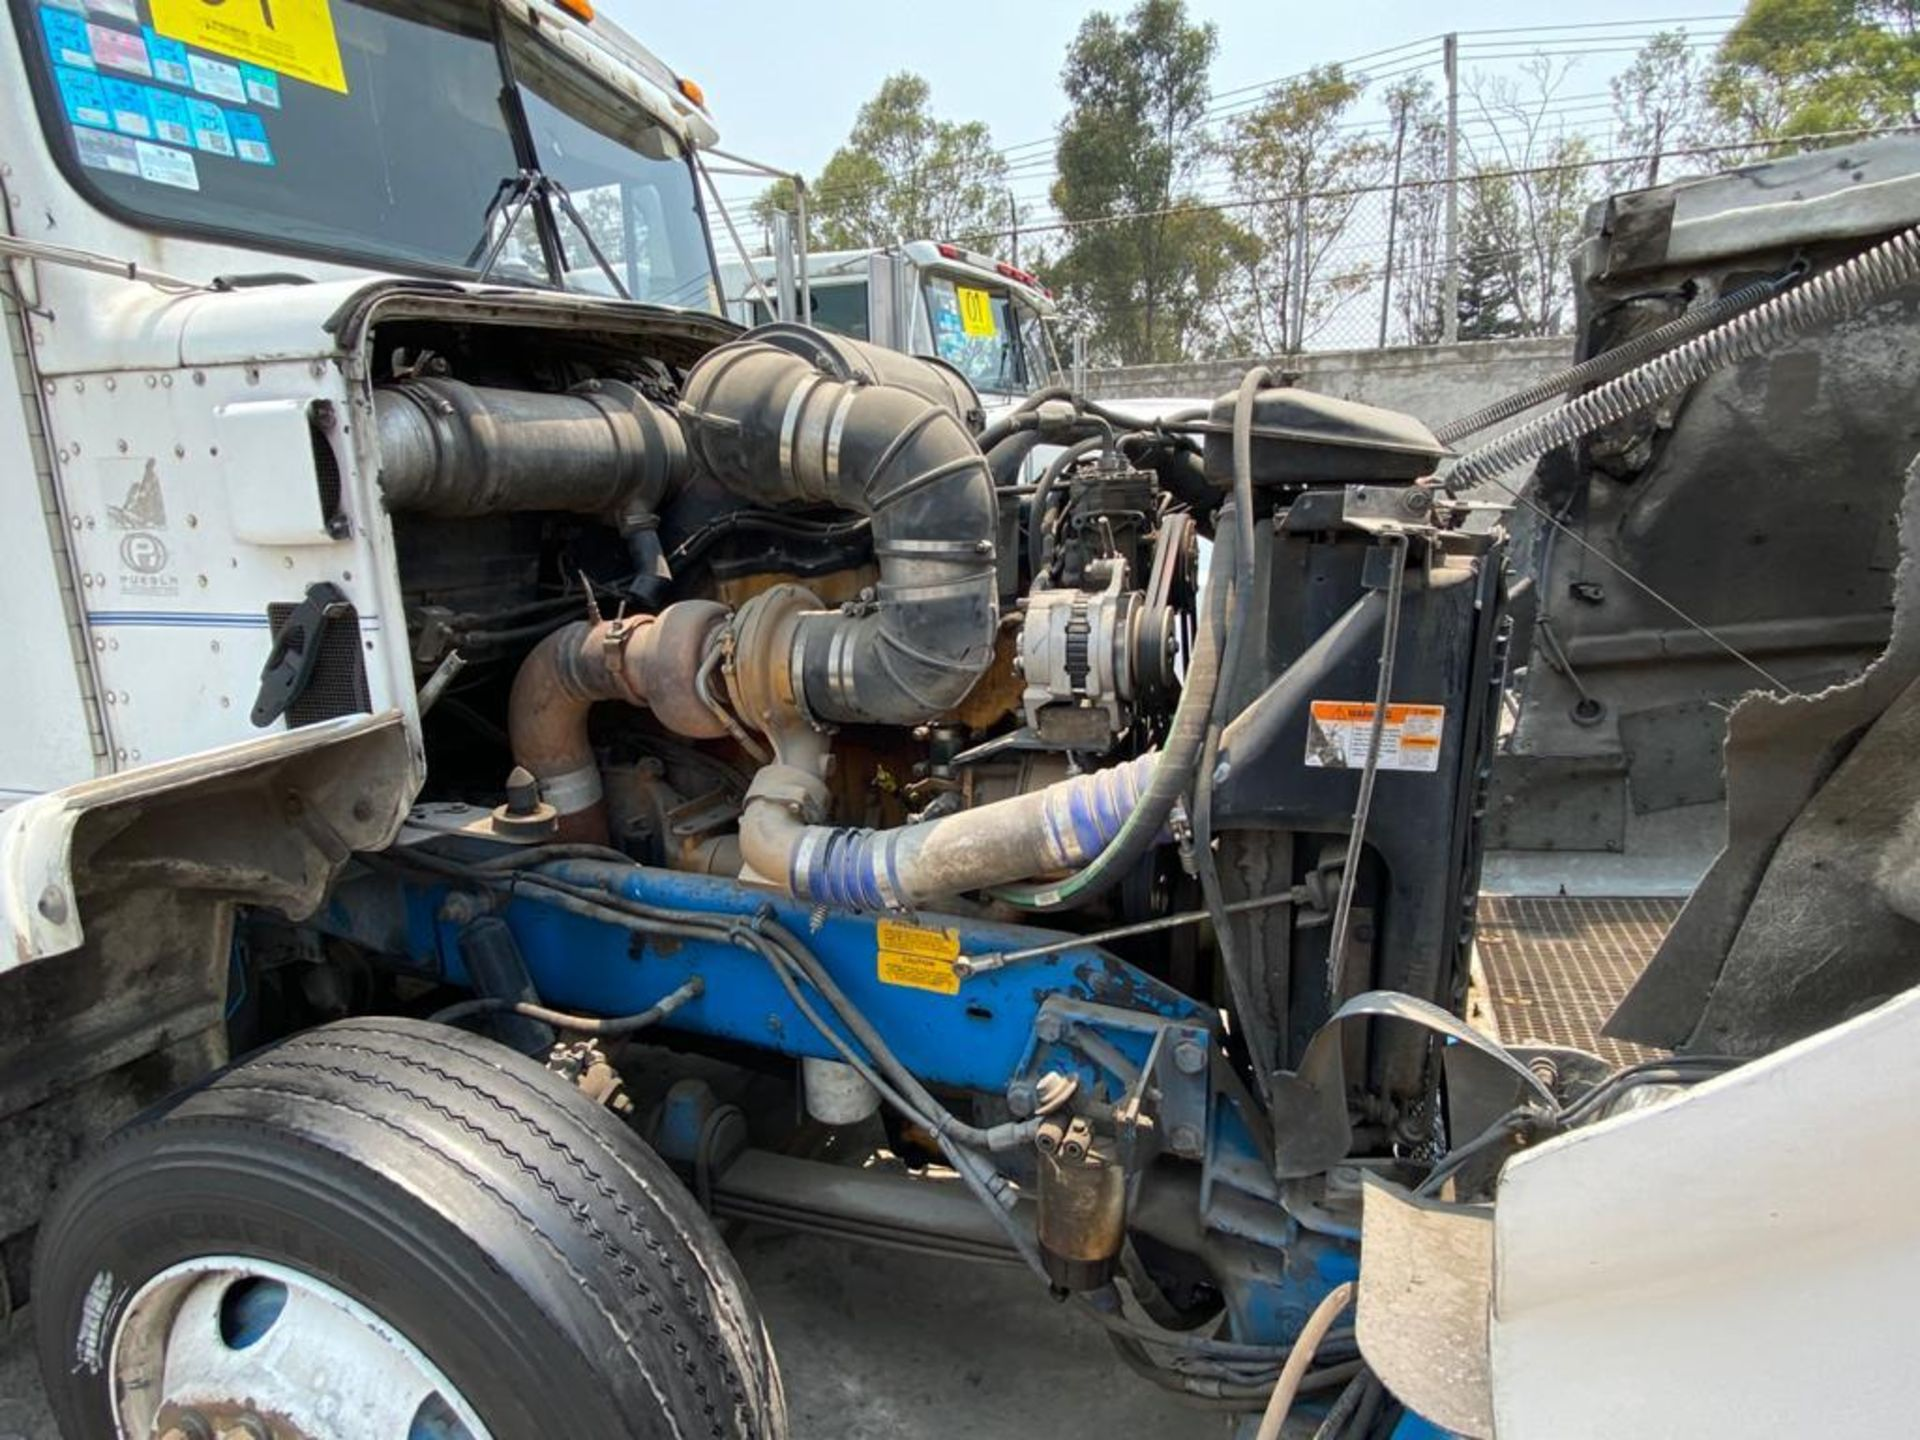 1999 Kenworth Sleeper truck tractor, standard transmission of 18 speeds - Image 59 of 70